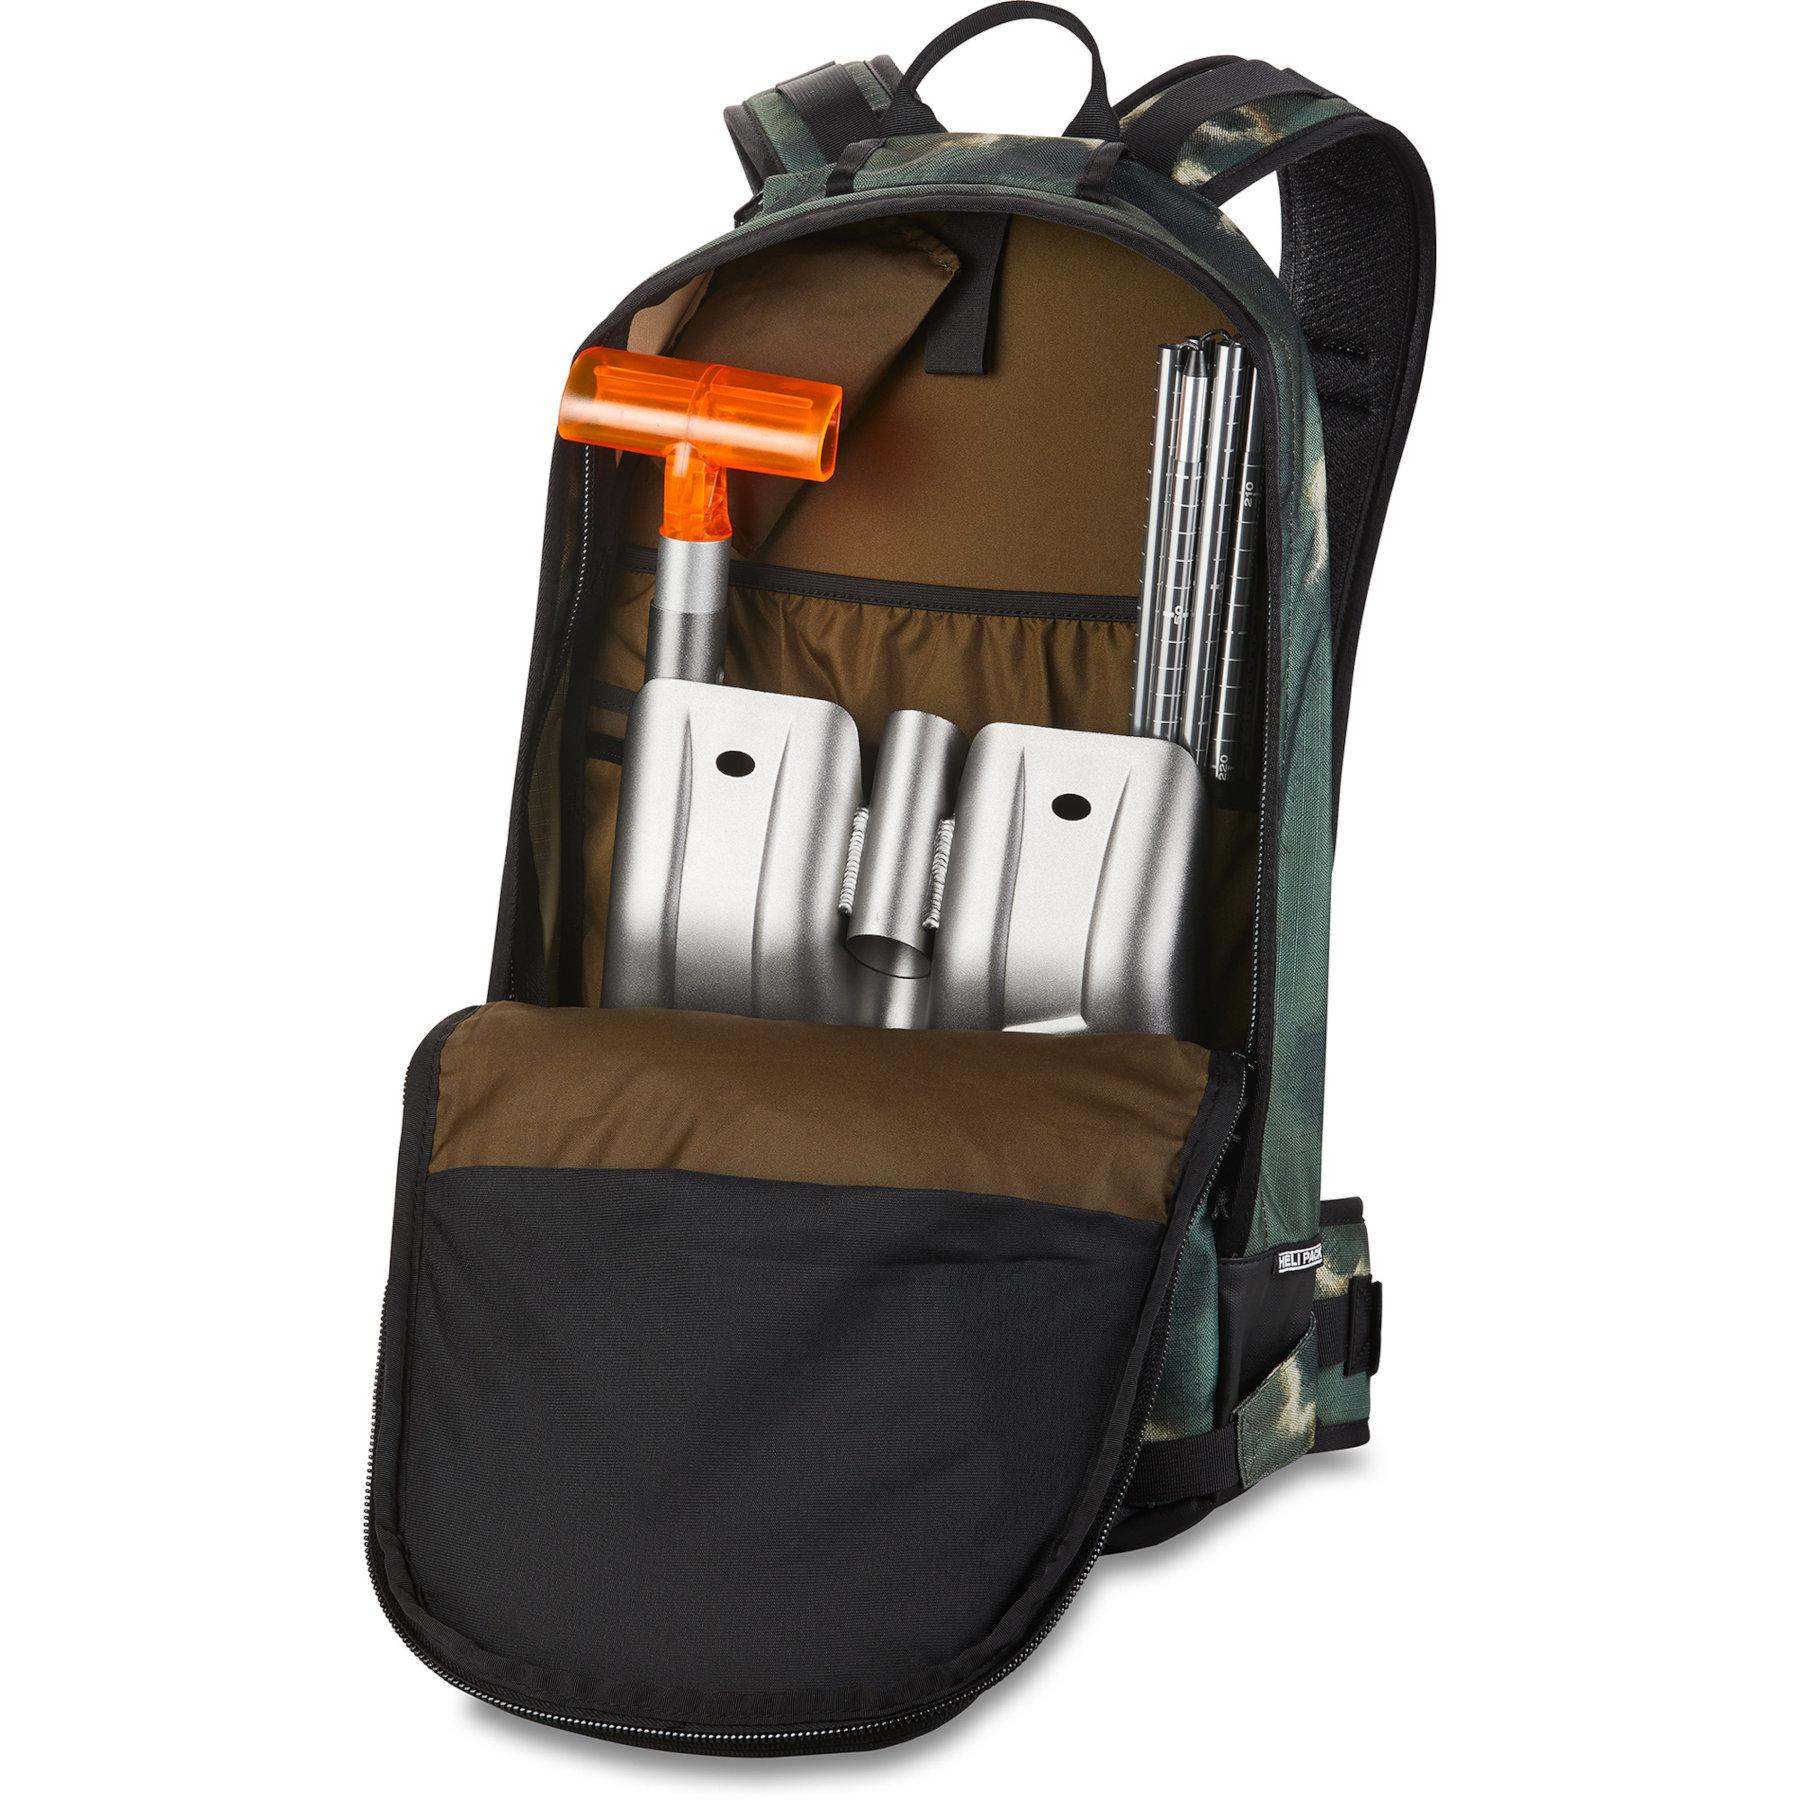 Image of Dakine 96' Heli Pack 16L Backpack - Olive Ashcroft Camo